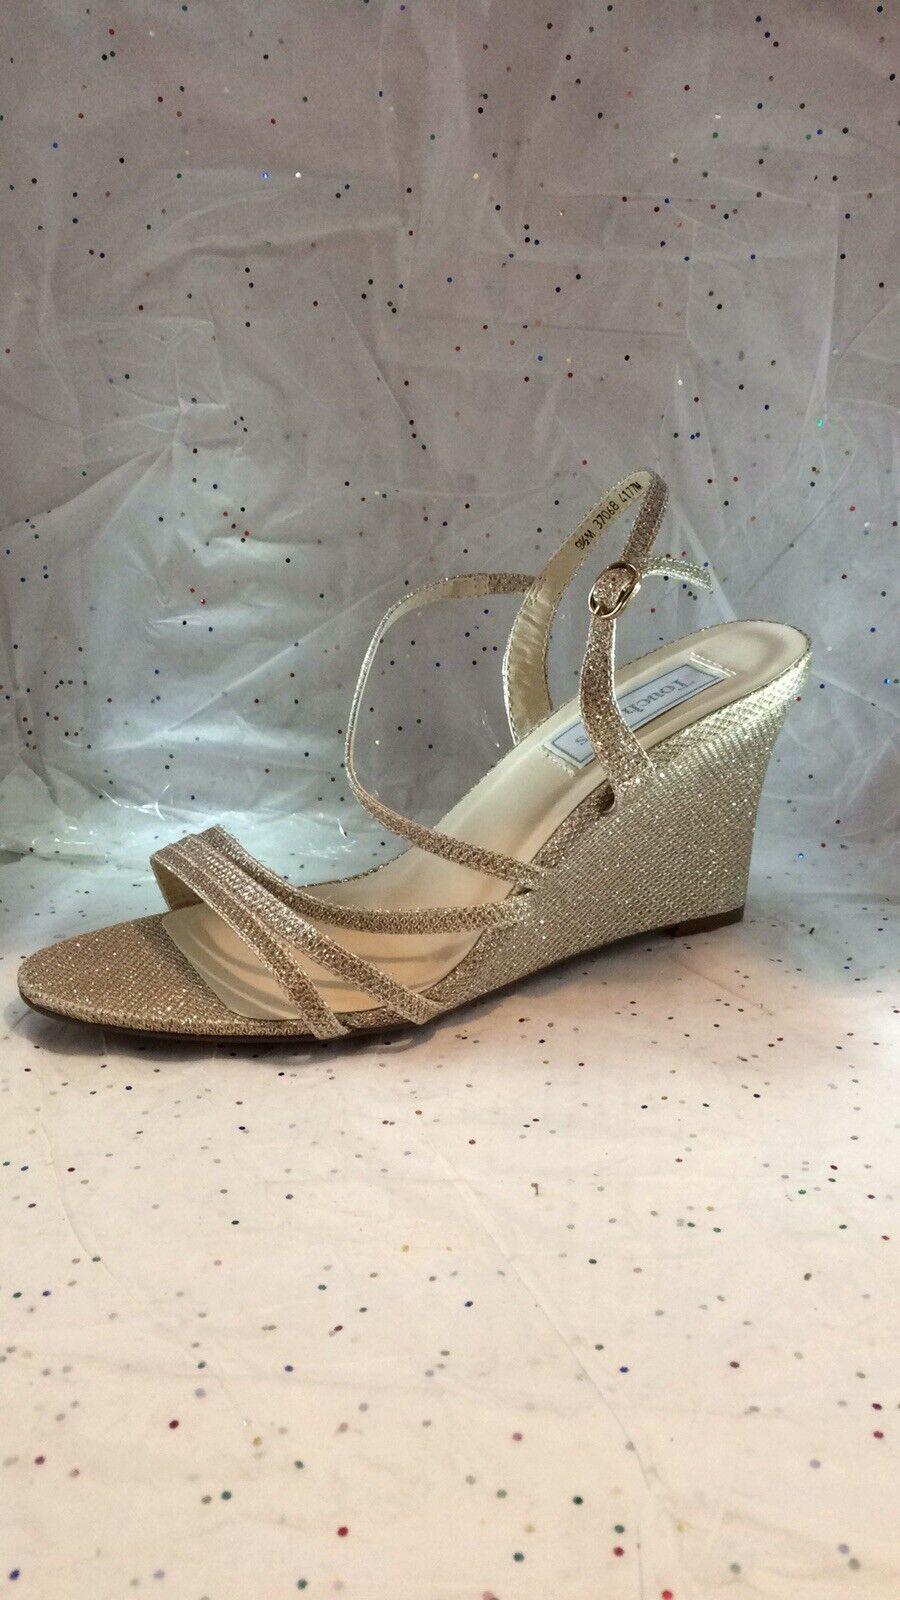 Touch Ups or Glitter Talon Compensé sandal Taille 91 2